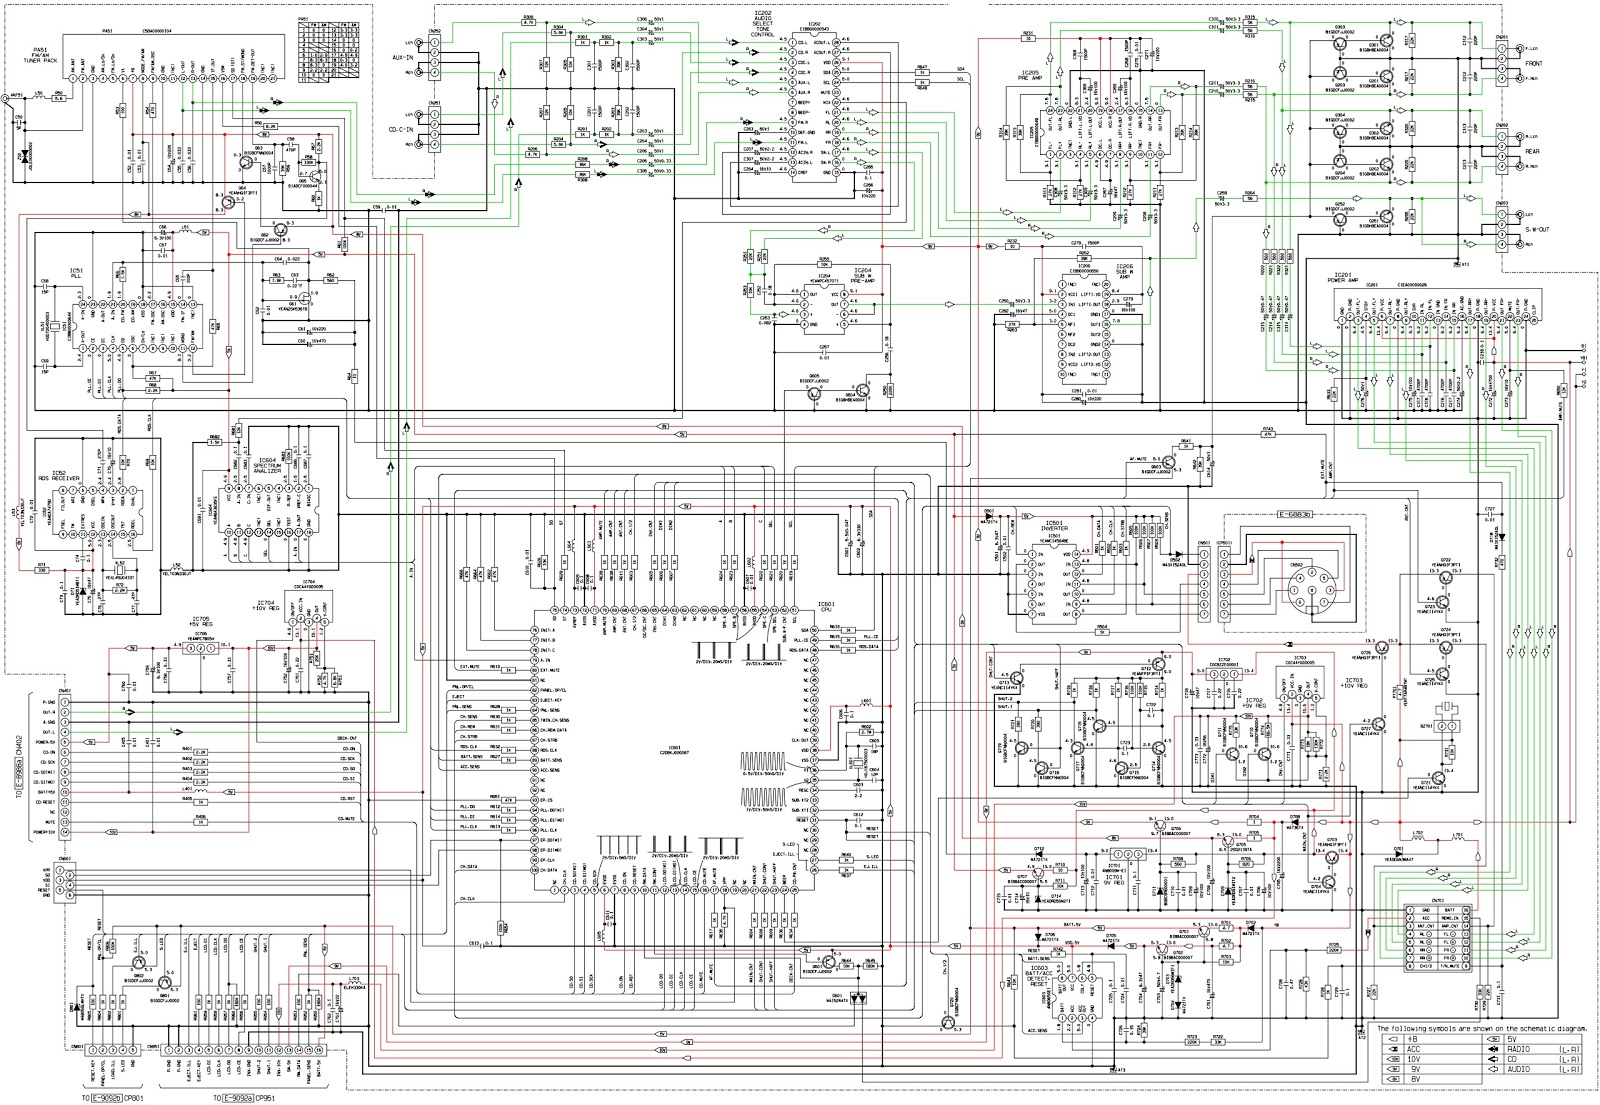 Schematic Diagrams Panasonic Cq Dfx802